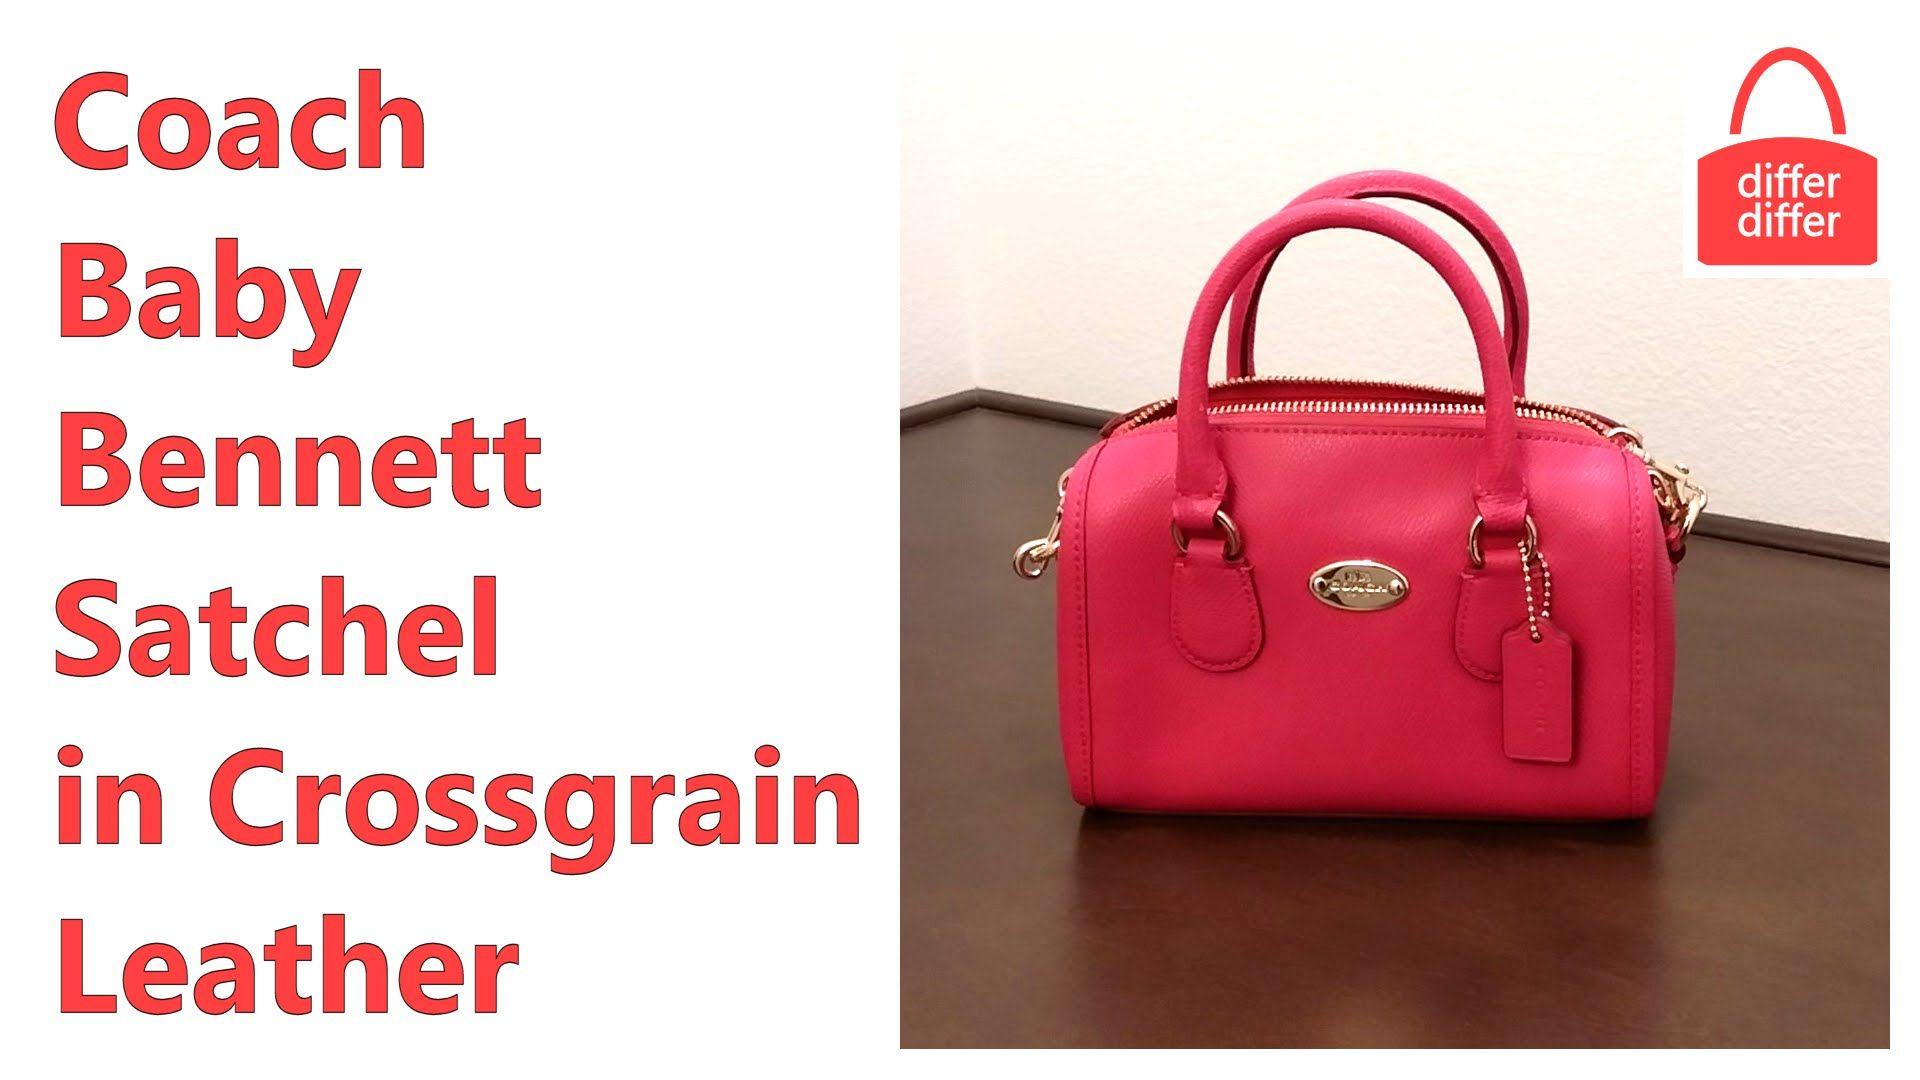 831275810fa4 Coach Baby Bennett Satchel in Crossgrain Leather 34641